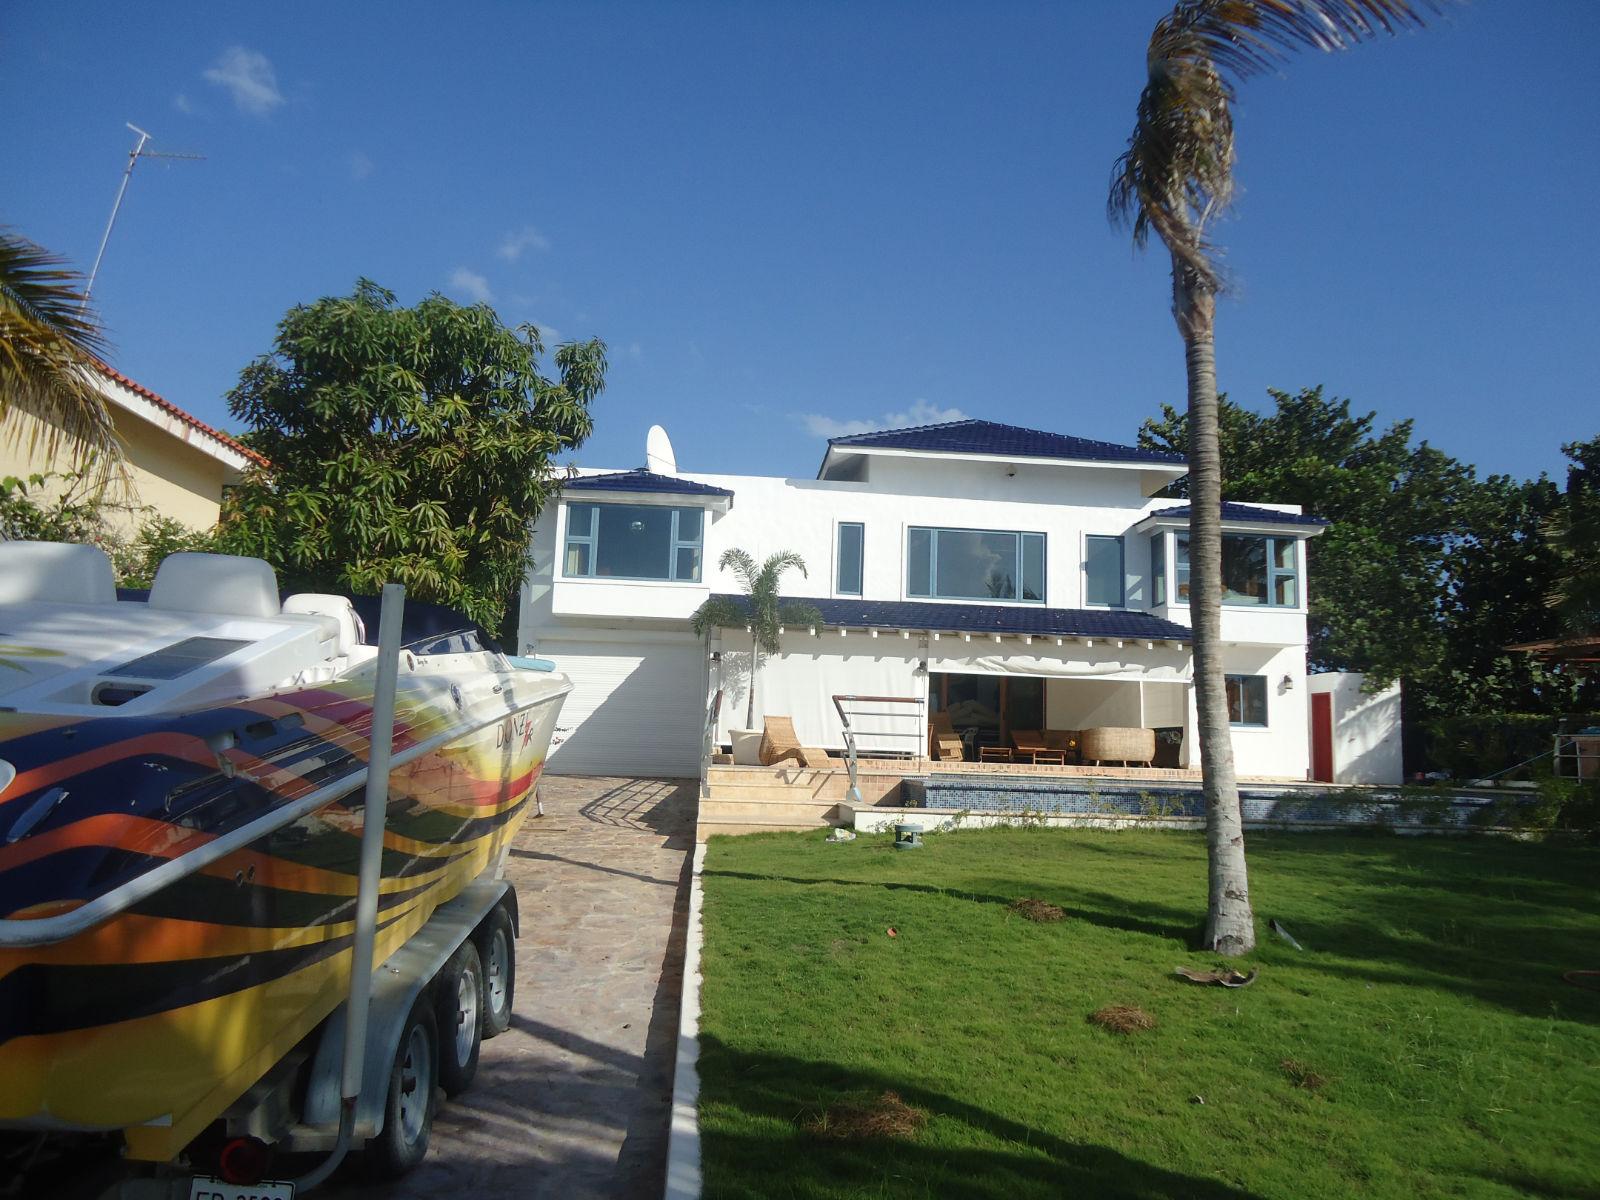 Beach house at Palmar De Ocoa with private beach and yacht